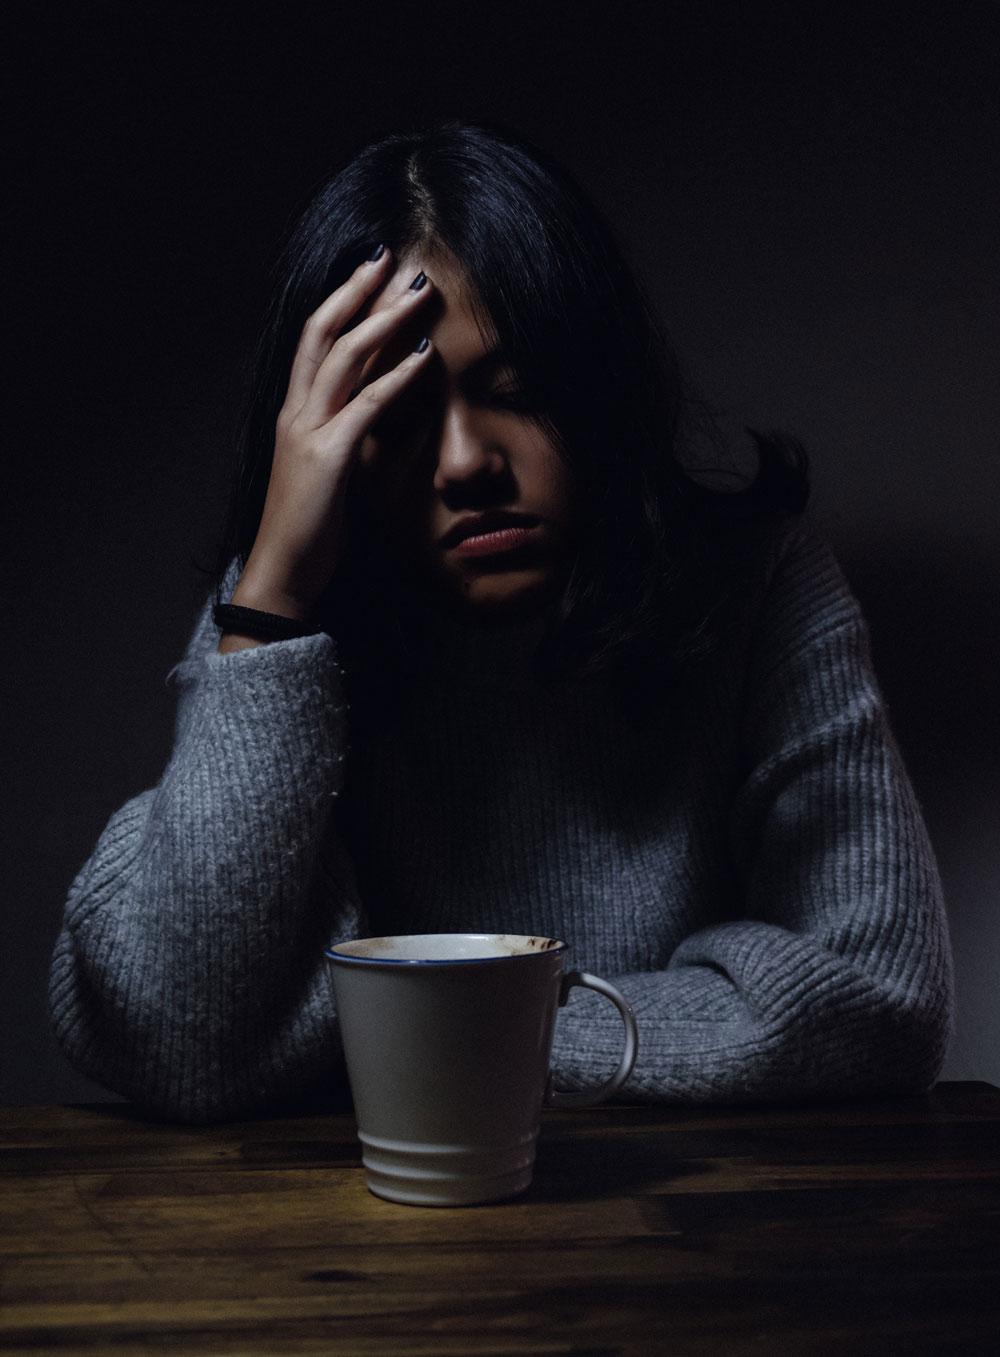 Bei Kopfschmerzen Tee trinken